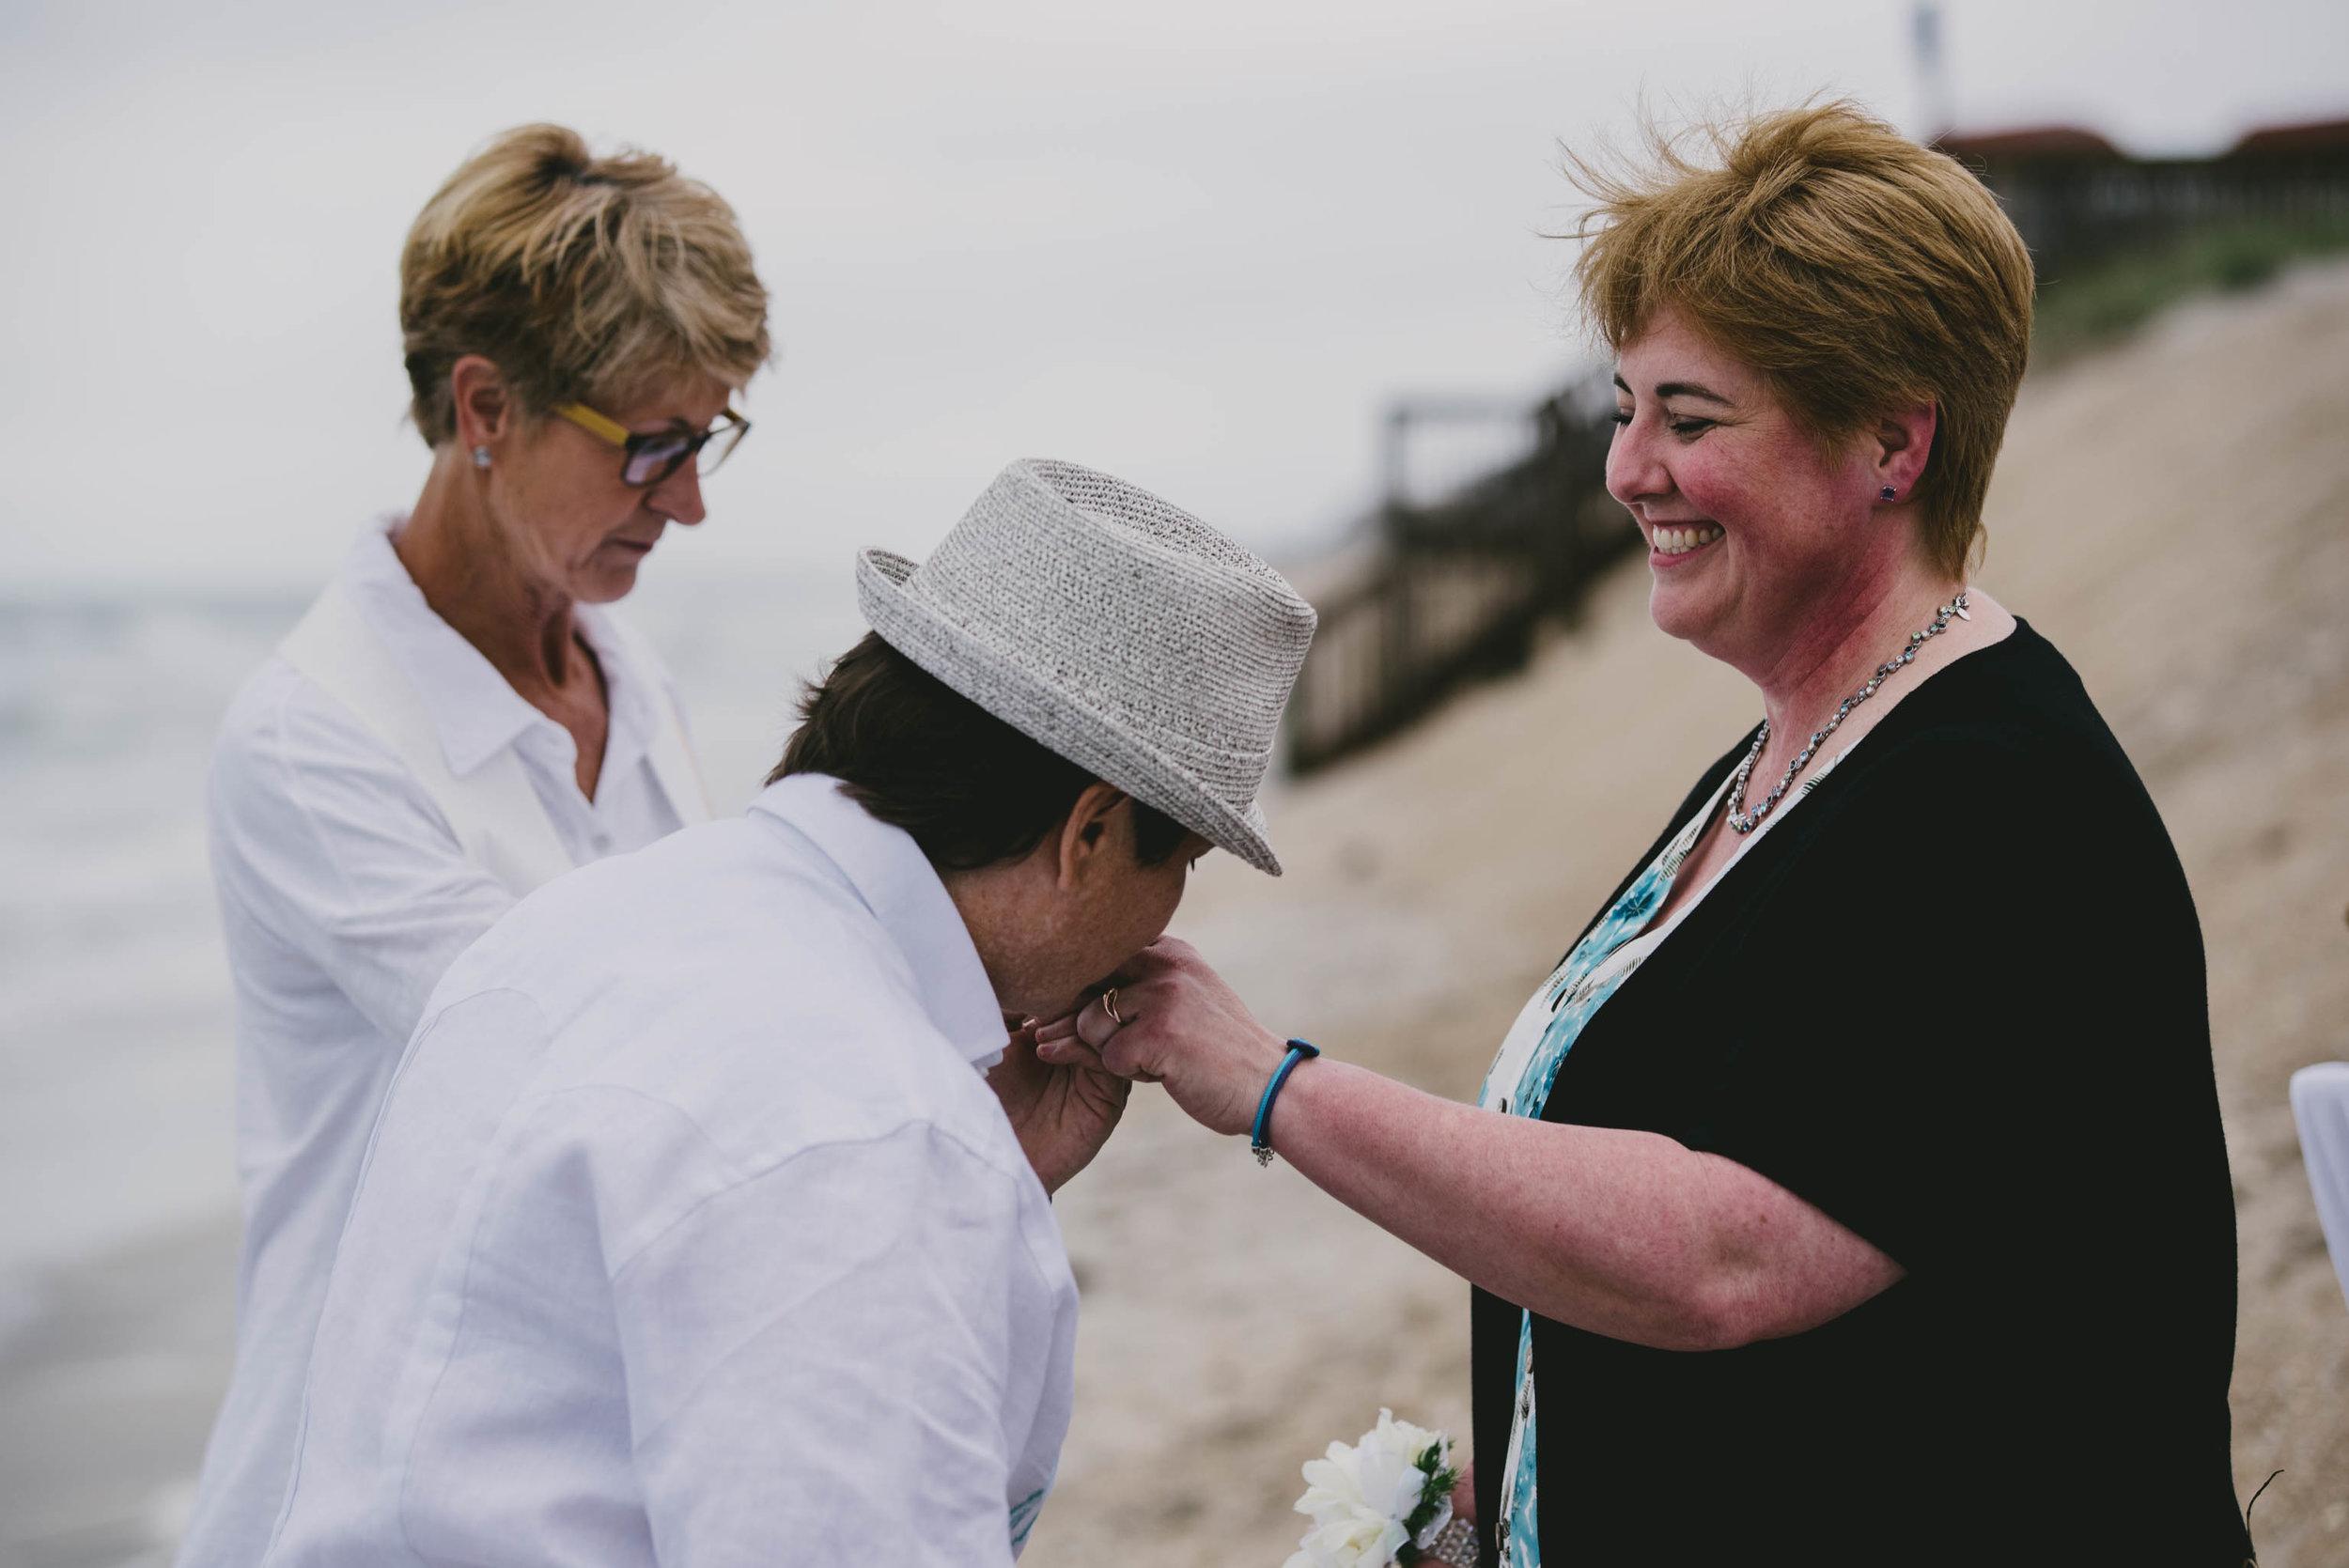 topsail-island-same-sex-beach-wedding-echange-of-rings-photo.jpg